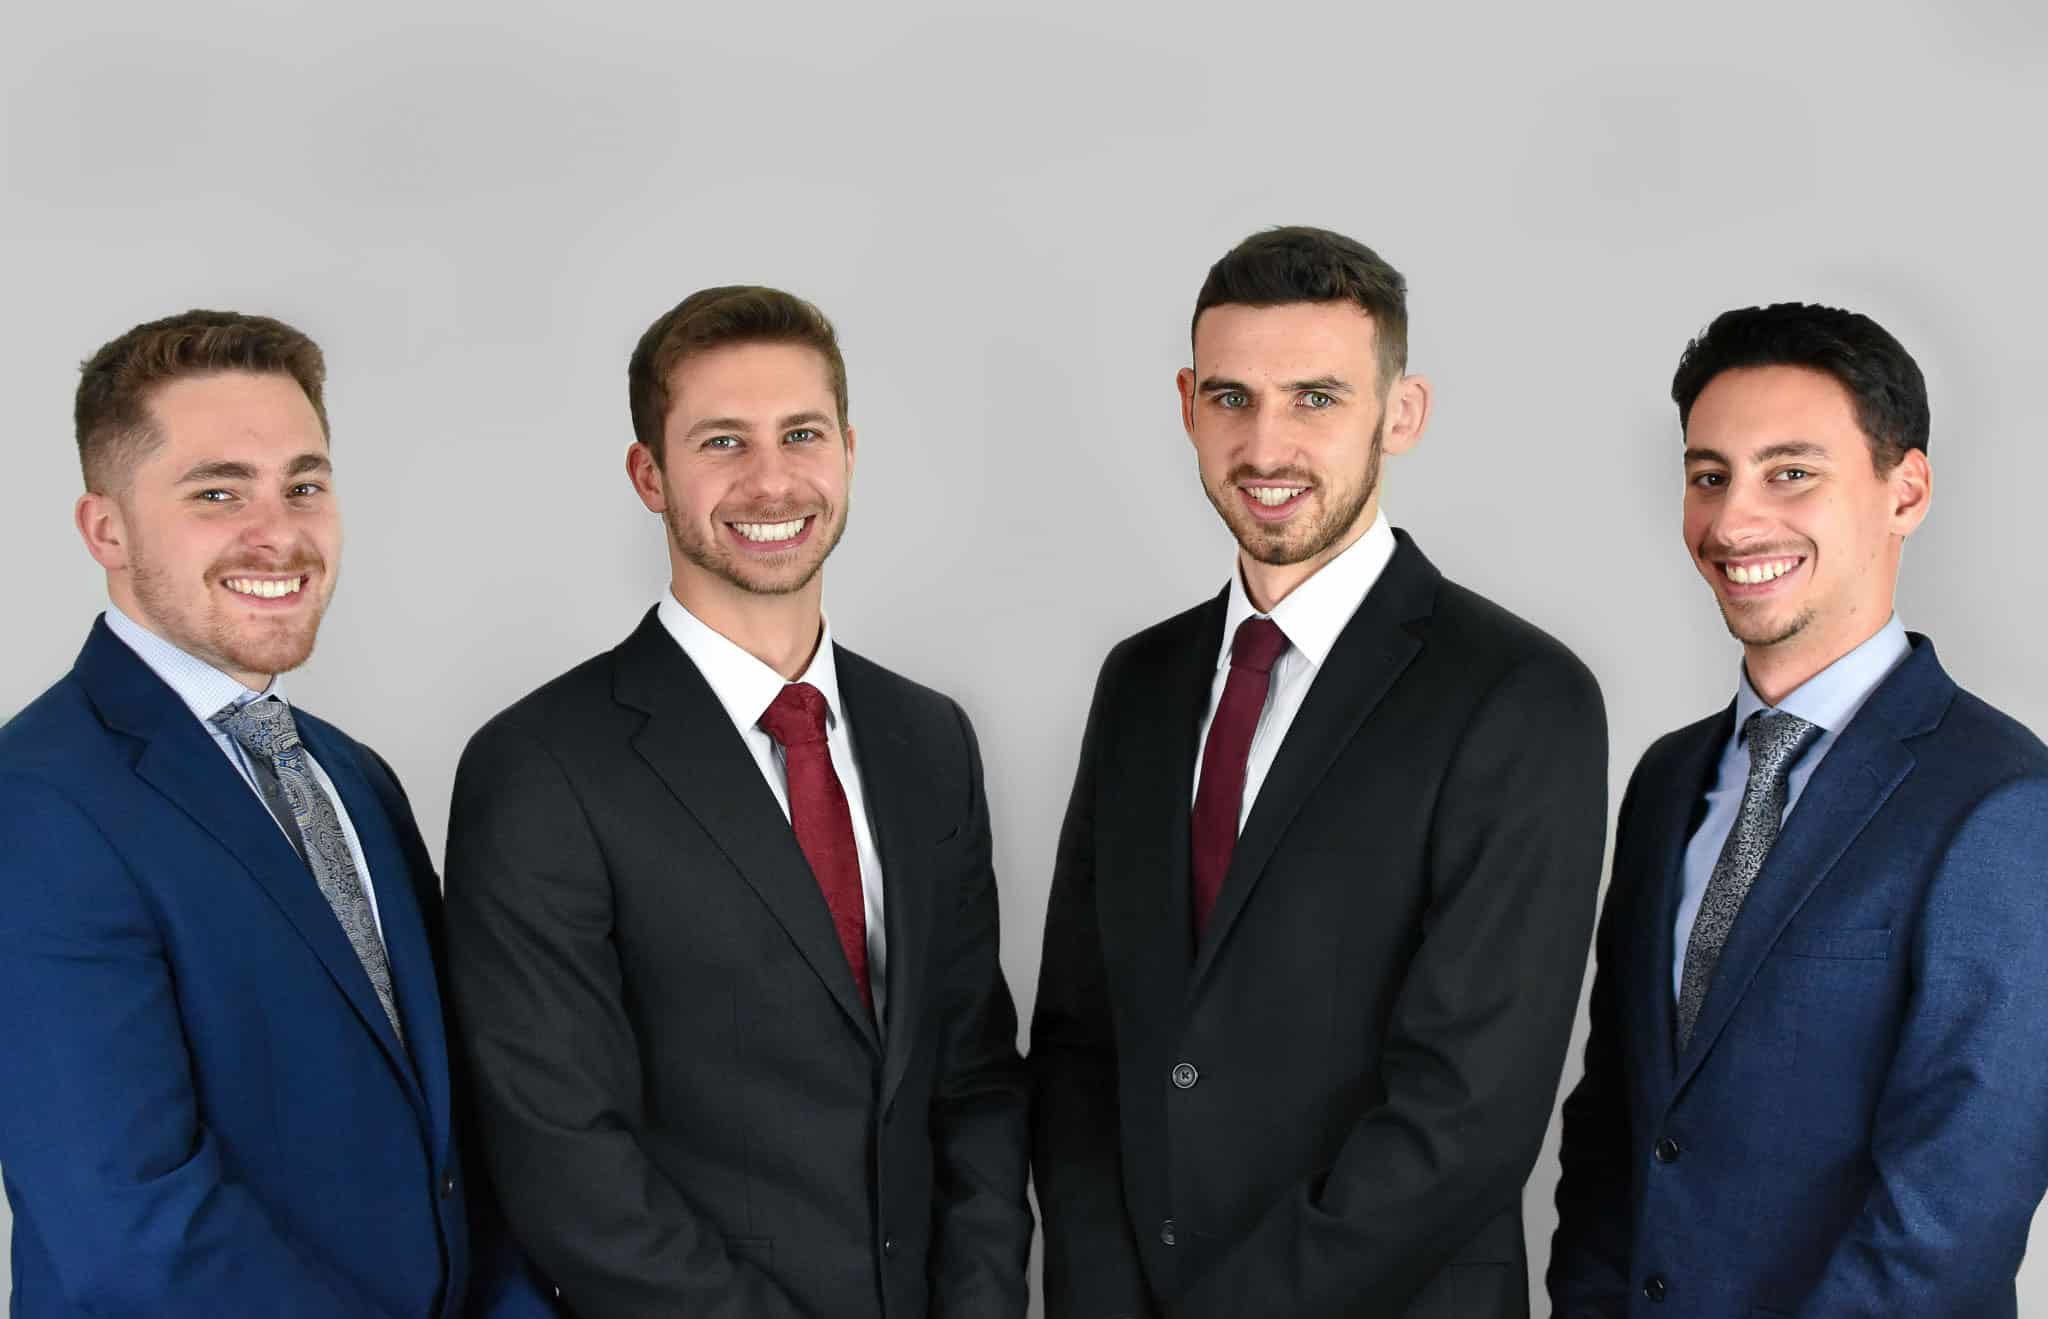 The Apogee Associates Team